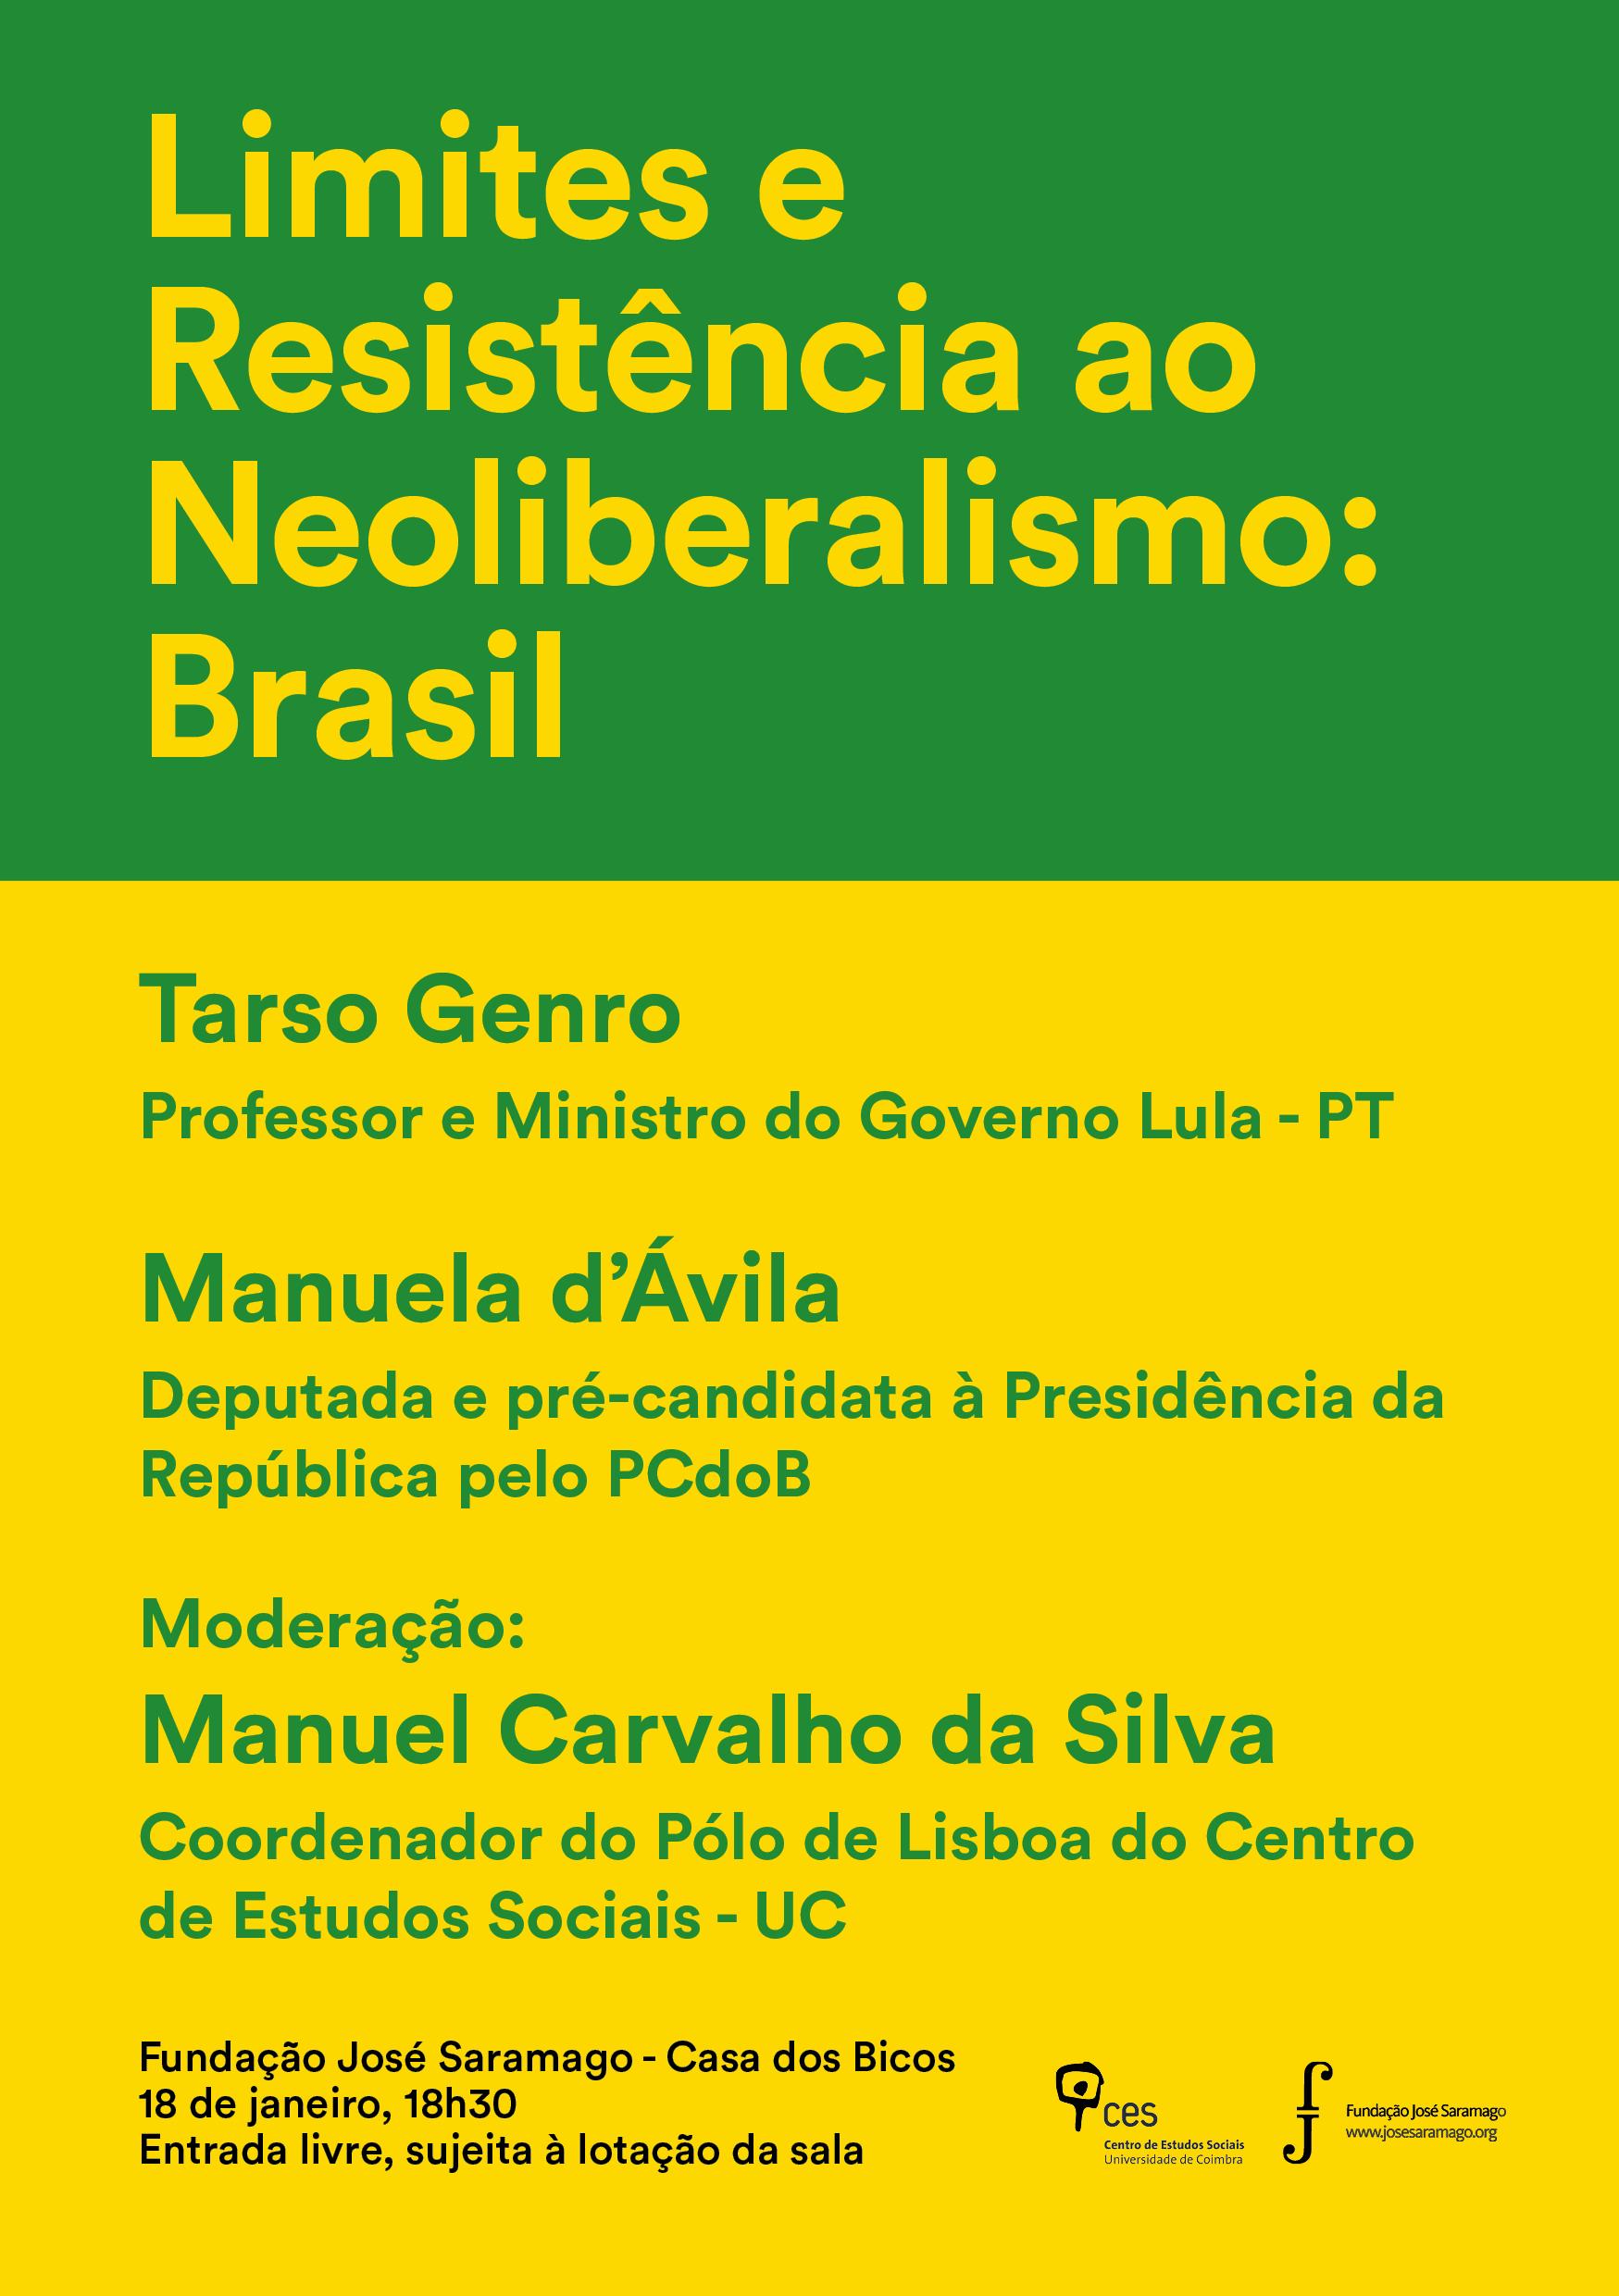 "Limites e Resistência ao Neoliberalismo: Brasil<span id=""edit_18985""><script>$(function() { $('#edit_18985').load( ""/myces/user/editobj.php?tipo=evento&id=18985"" ); });</script></span>"